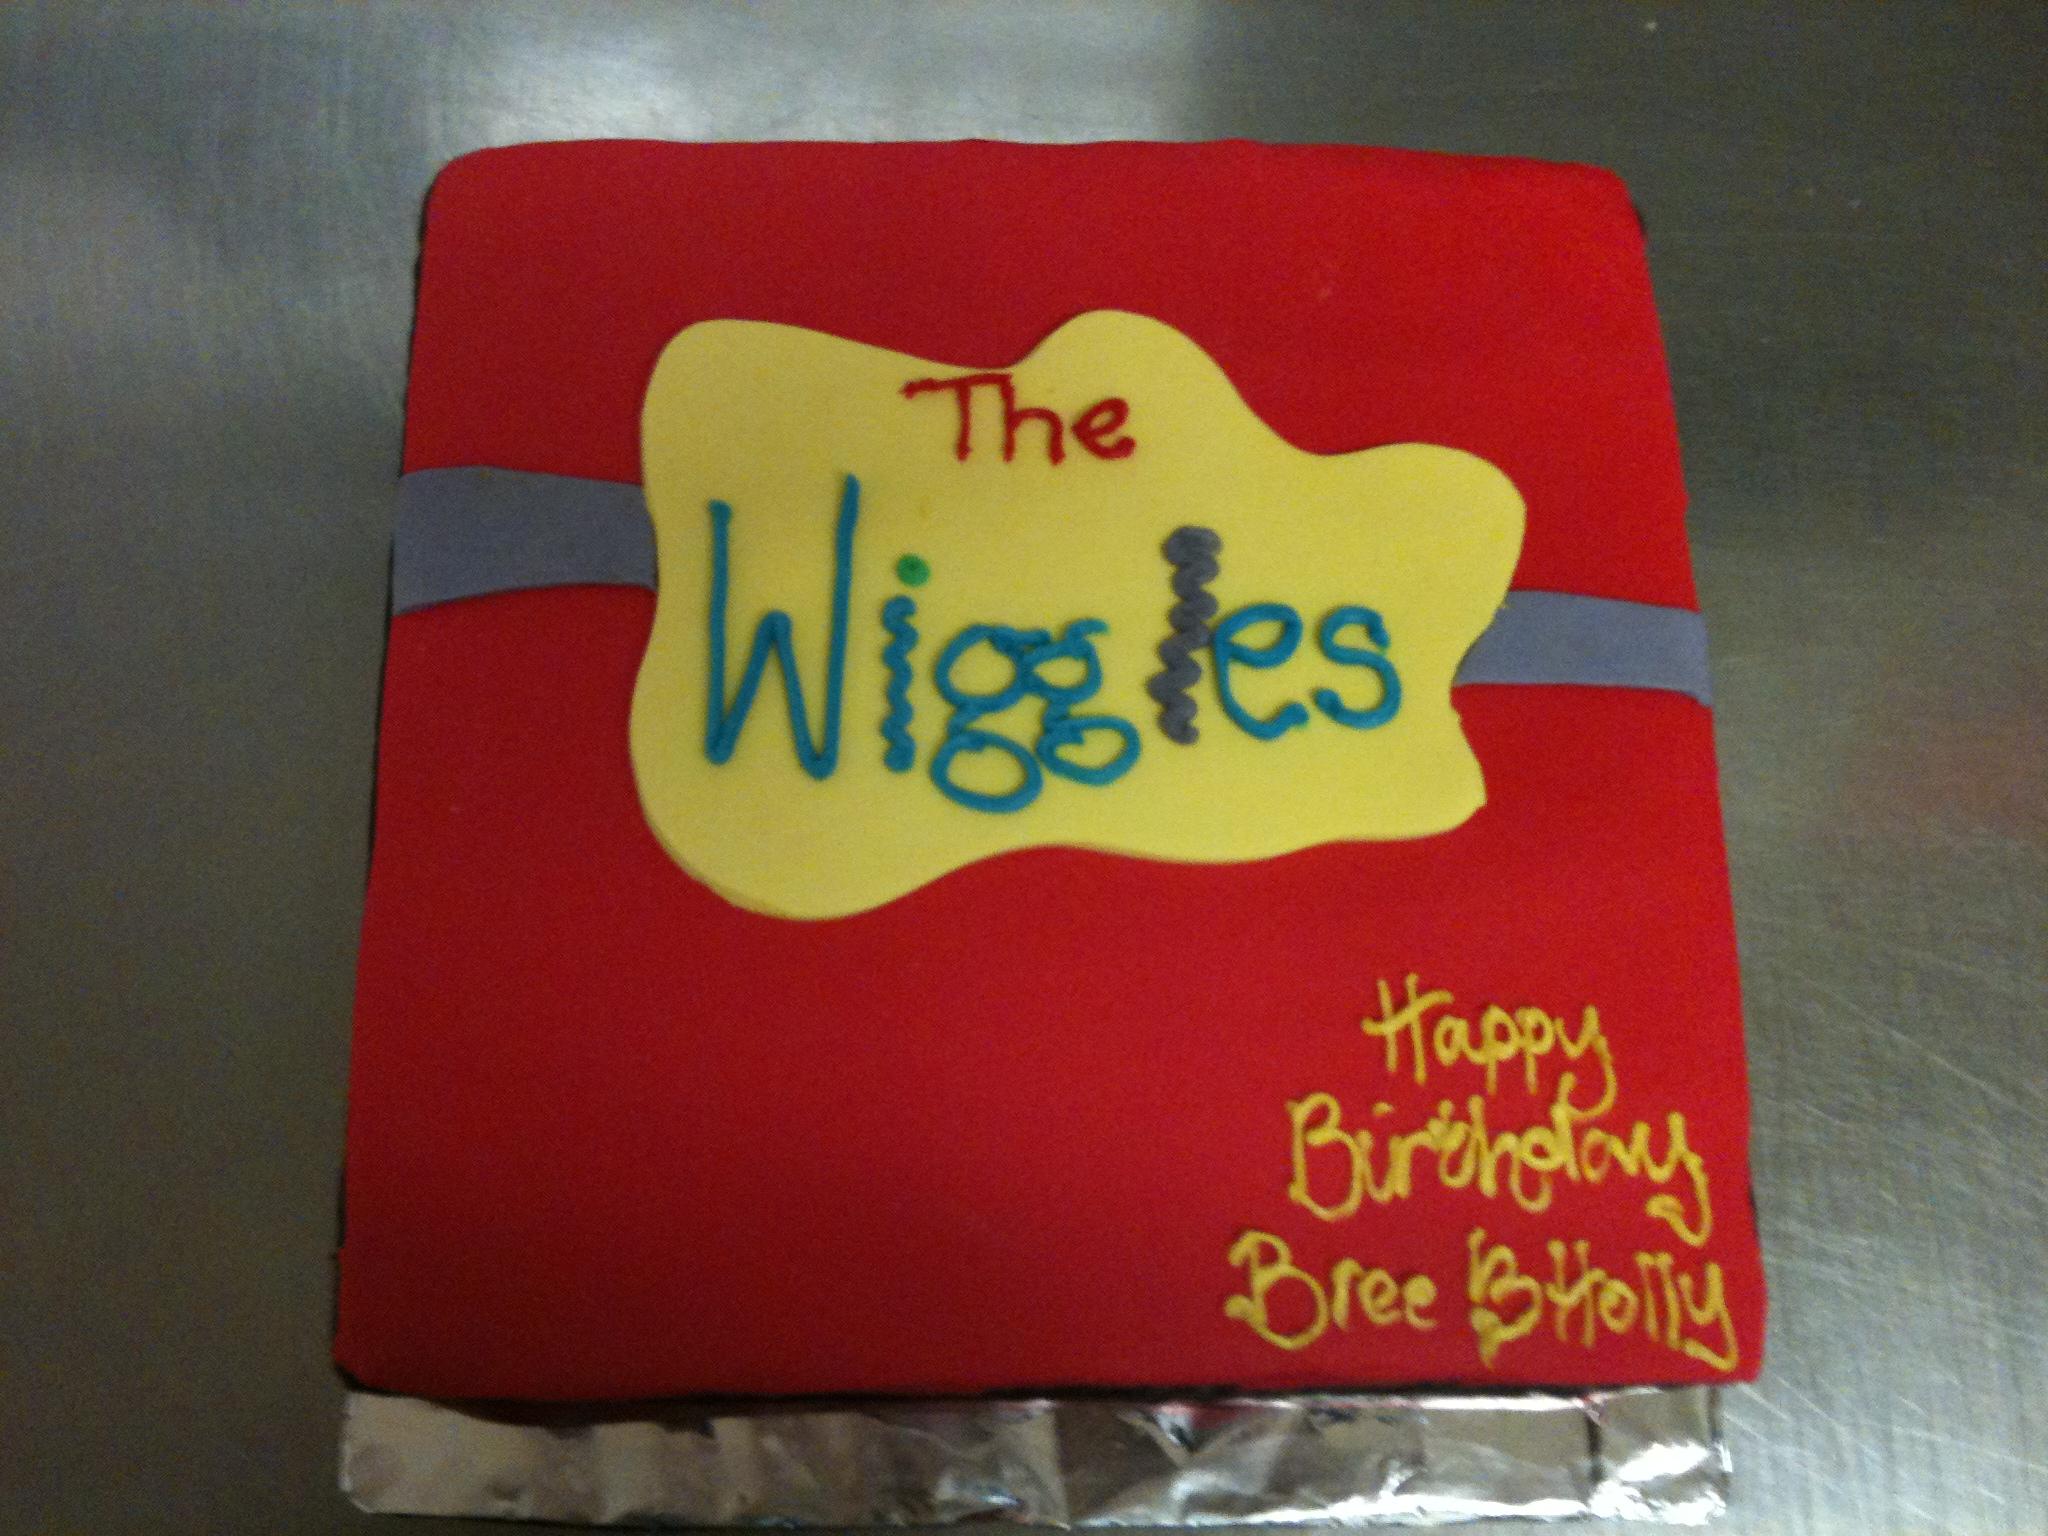 Wiggles logo.